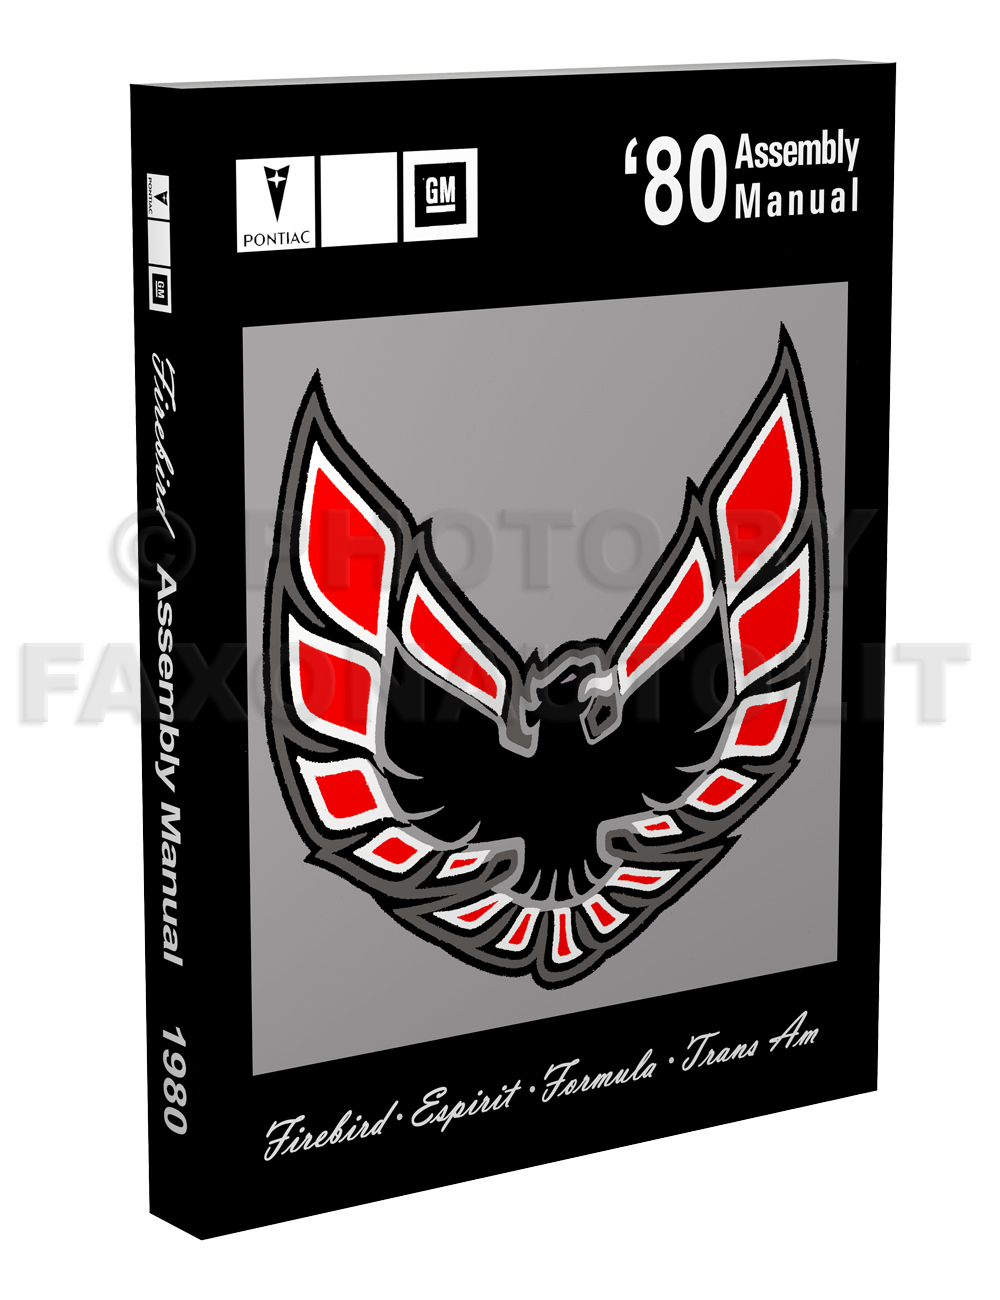 1980 Pontiac Firebird Assembly Manual Turbo Trans Am Esprit Formula Wiring Diagram